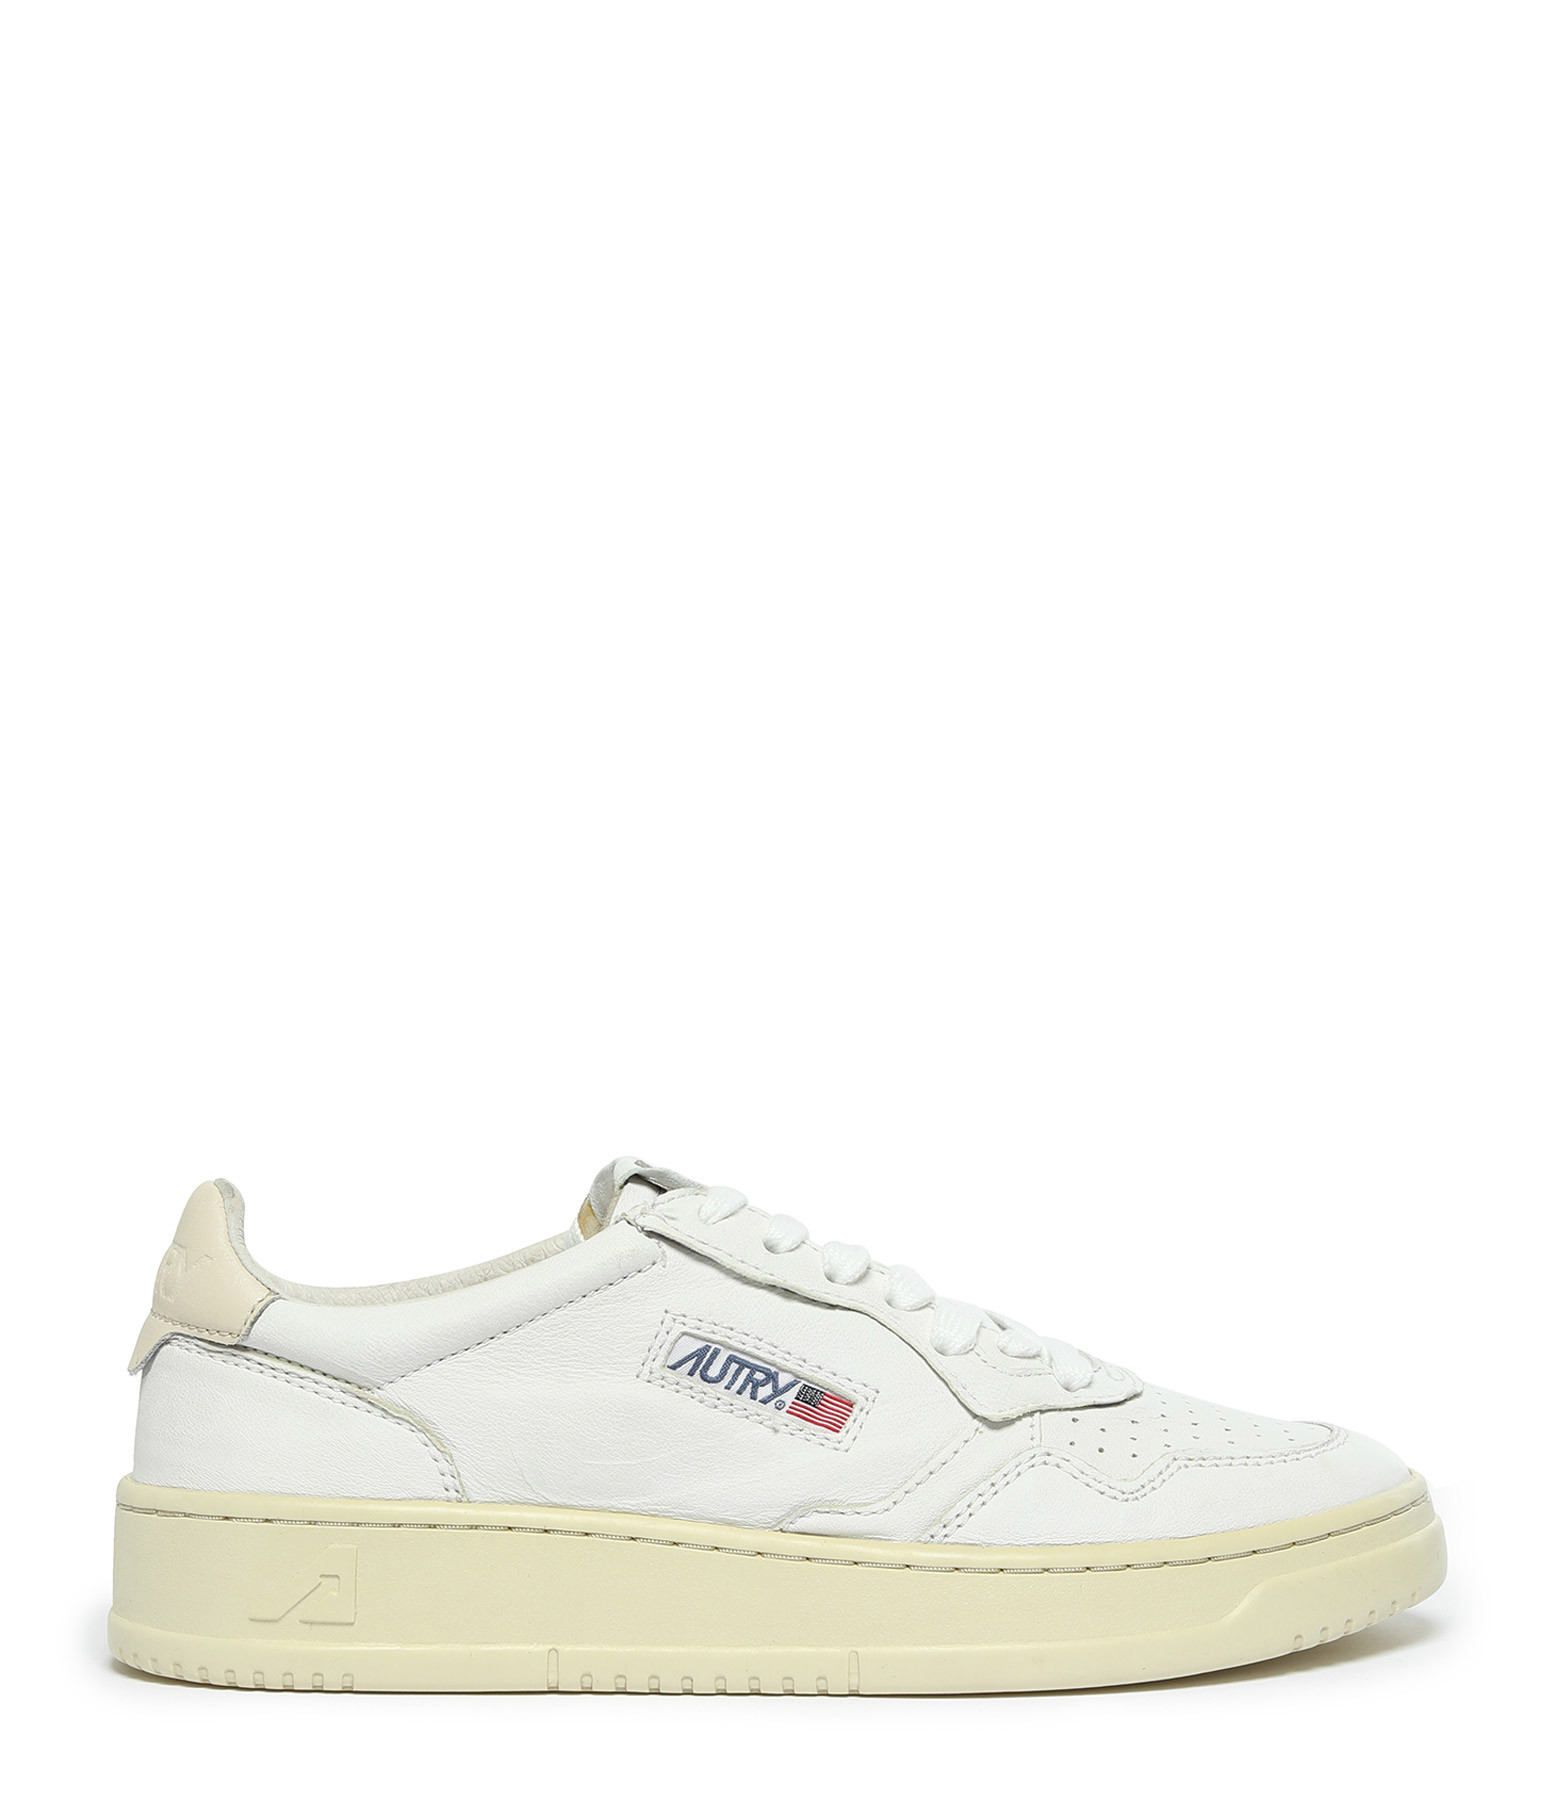 AUTRY - Baskets 01 Low Cuir Blanc